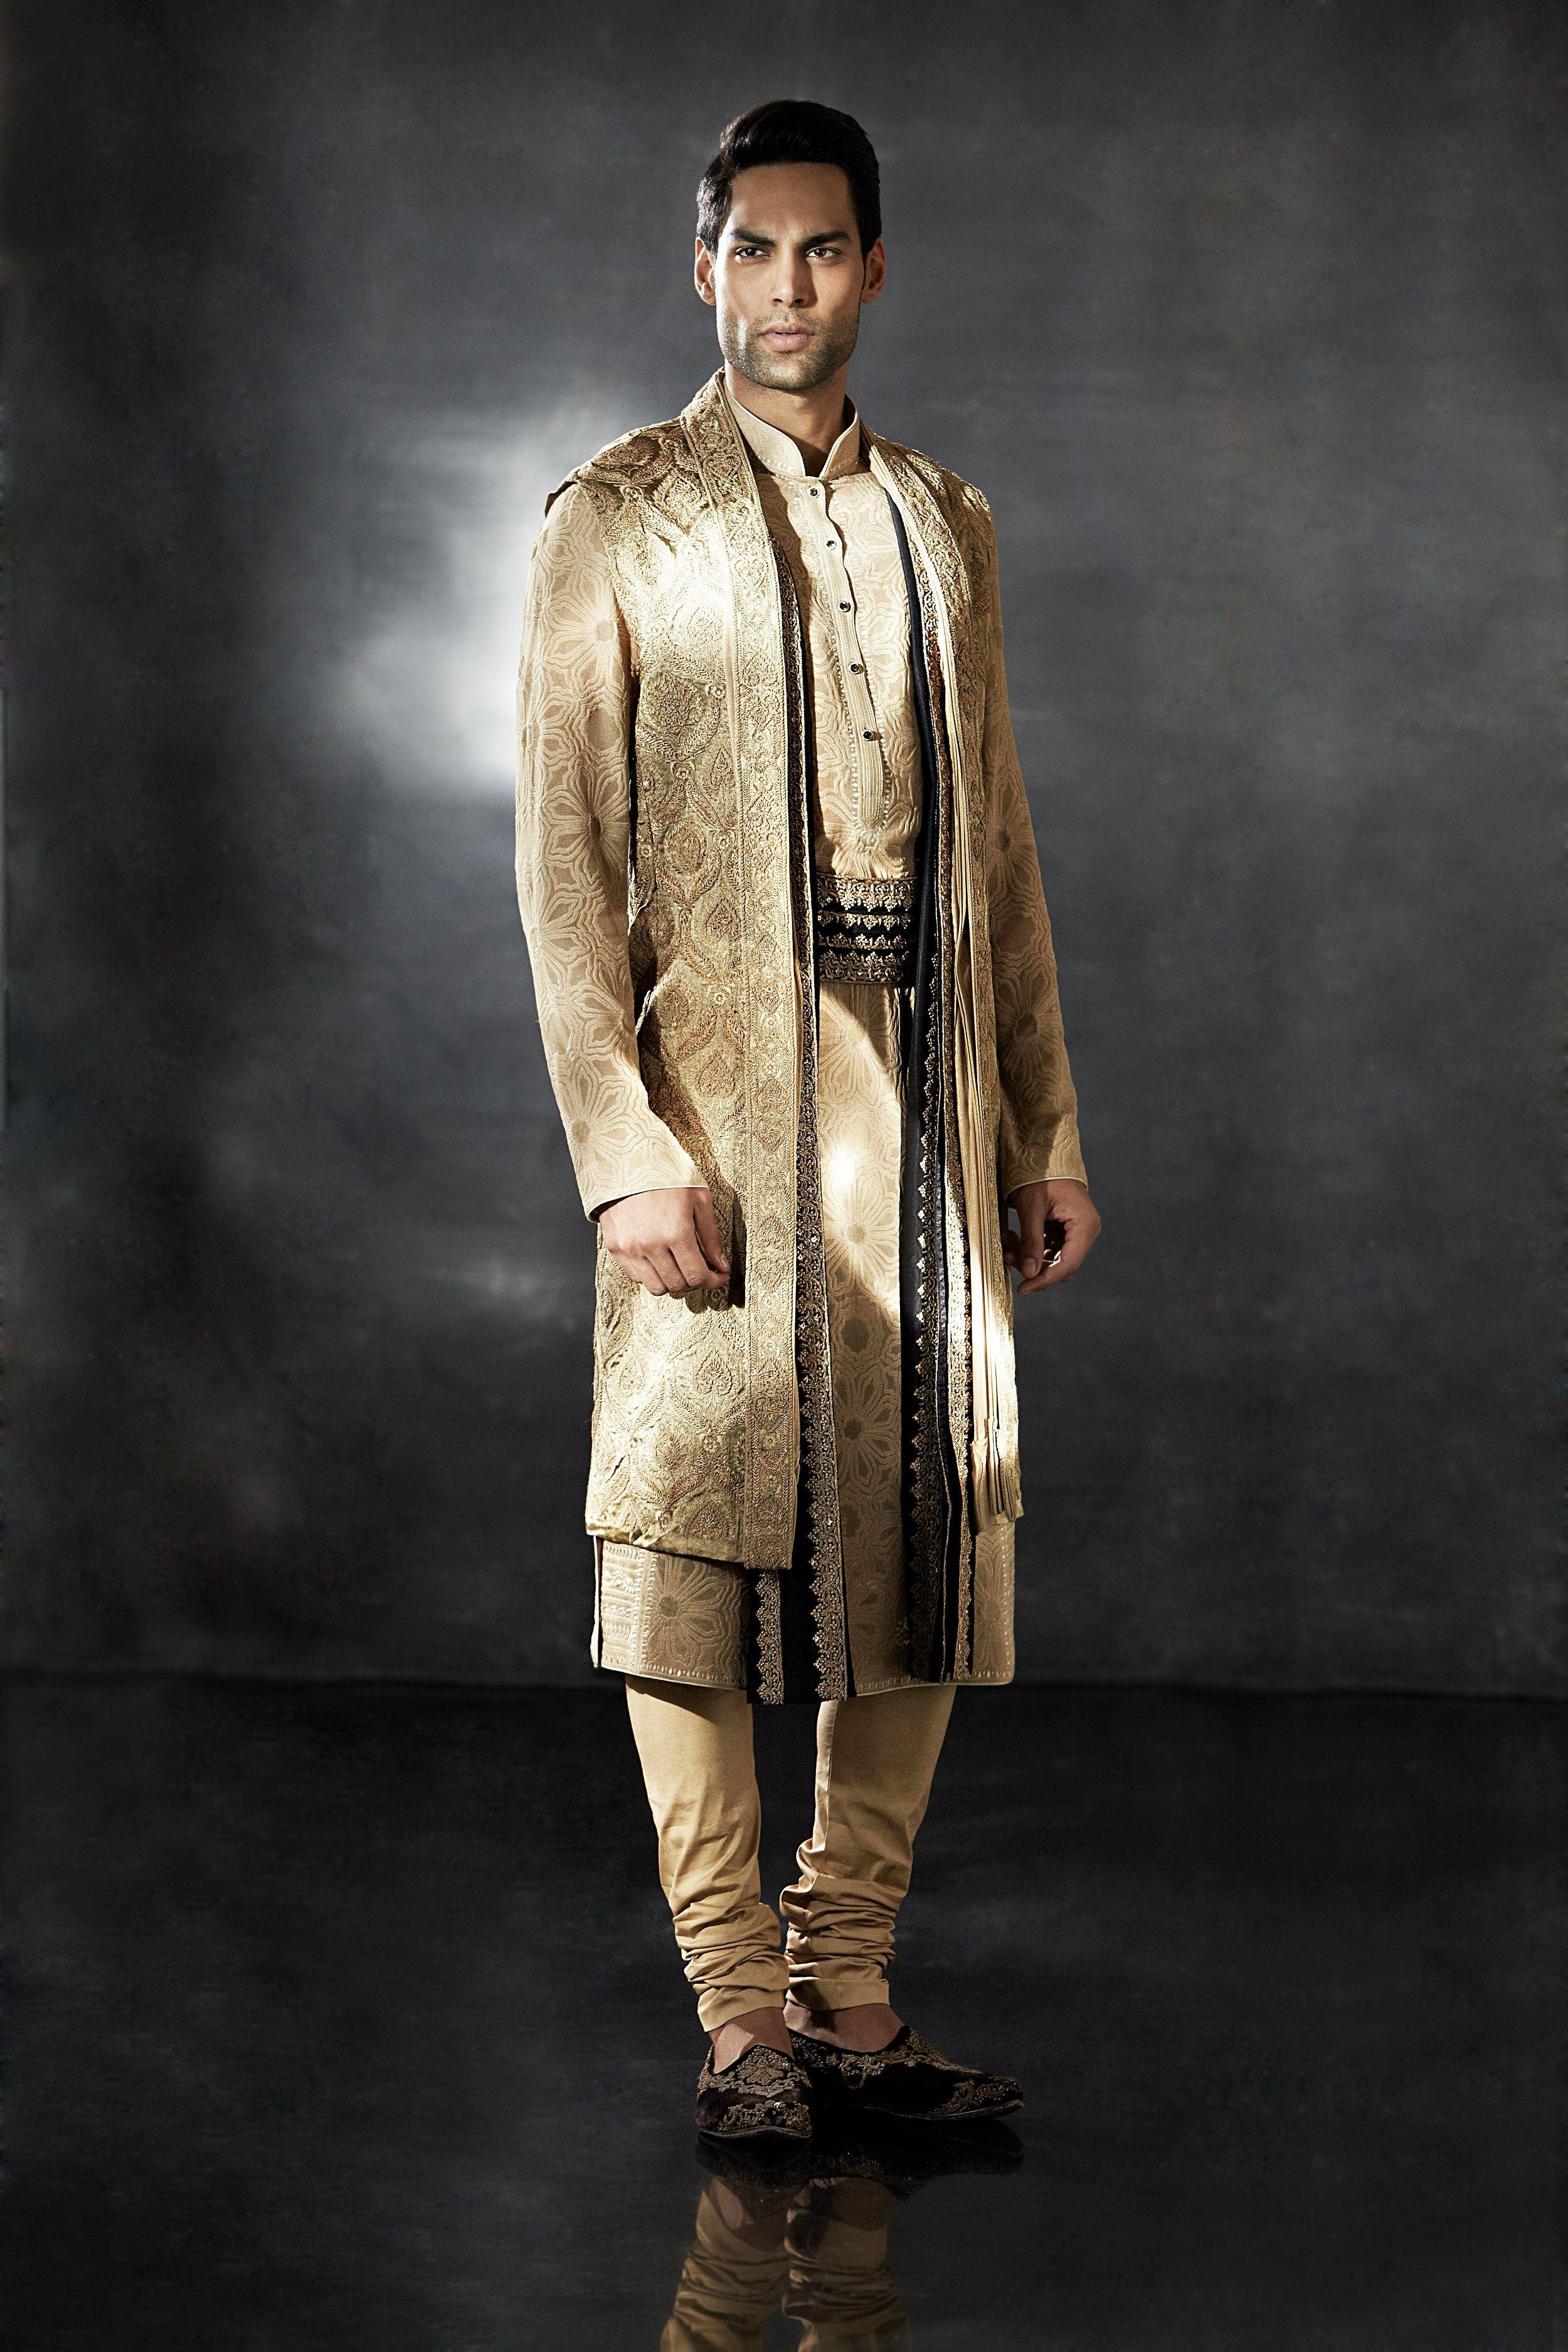 http://www.bing.com/images/search?q=tarun tahiliani | Men ...